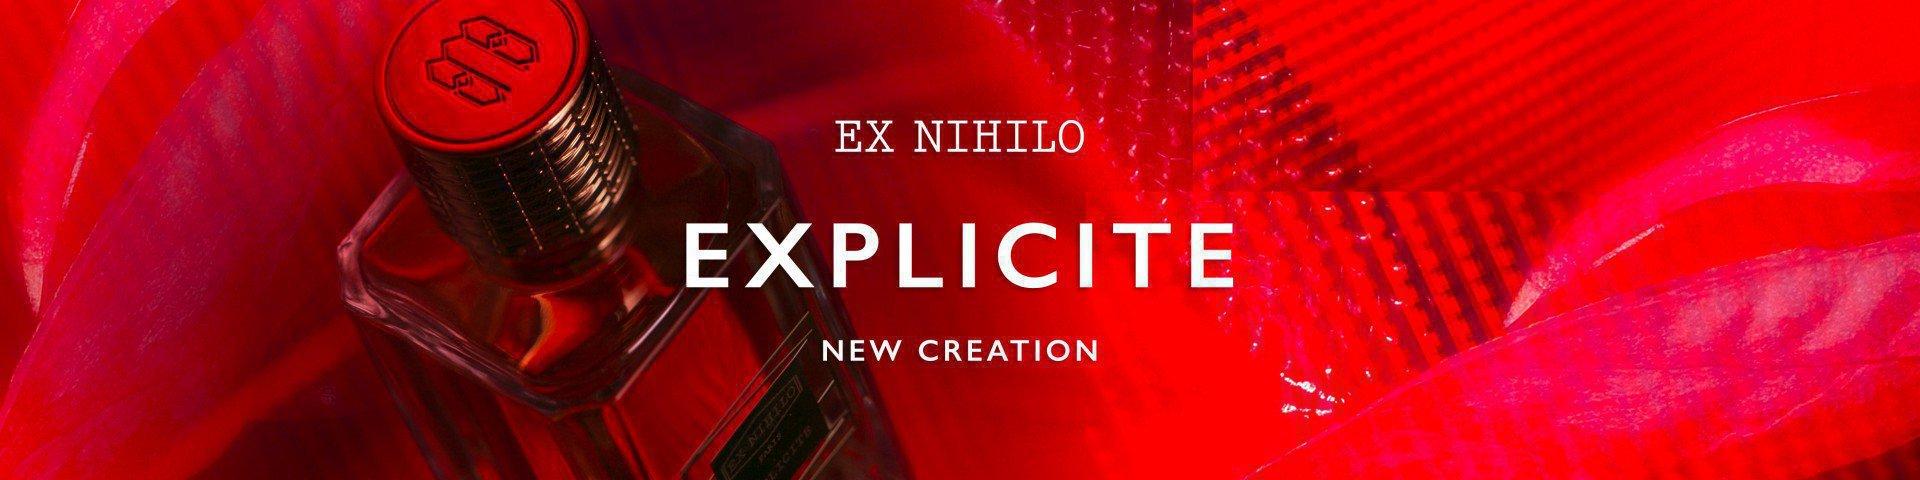 Новинка от EX NIHILO Explicite